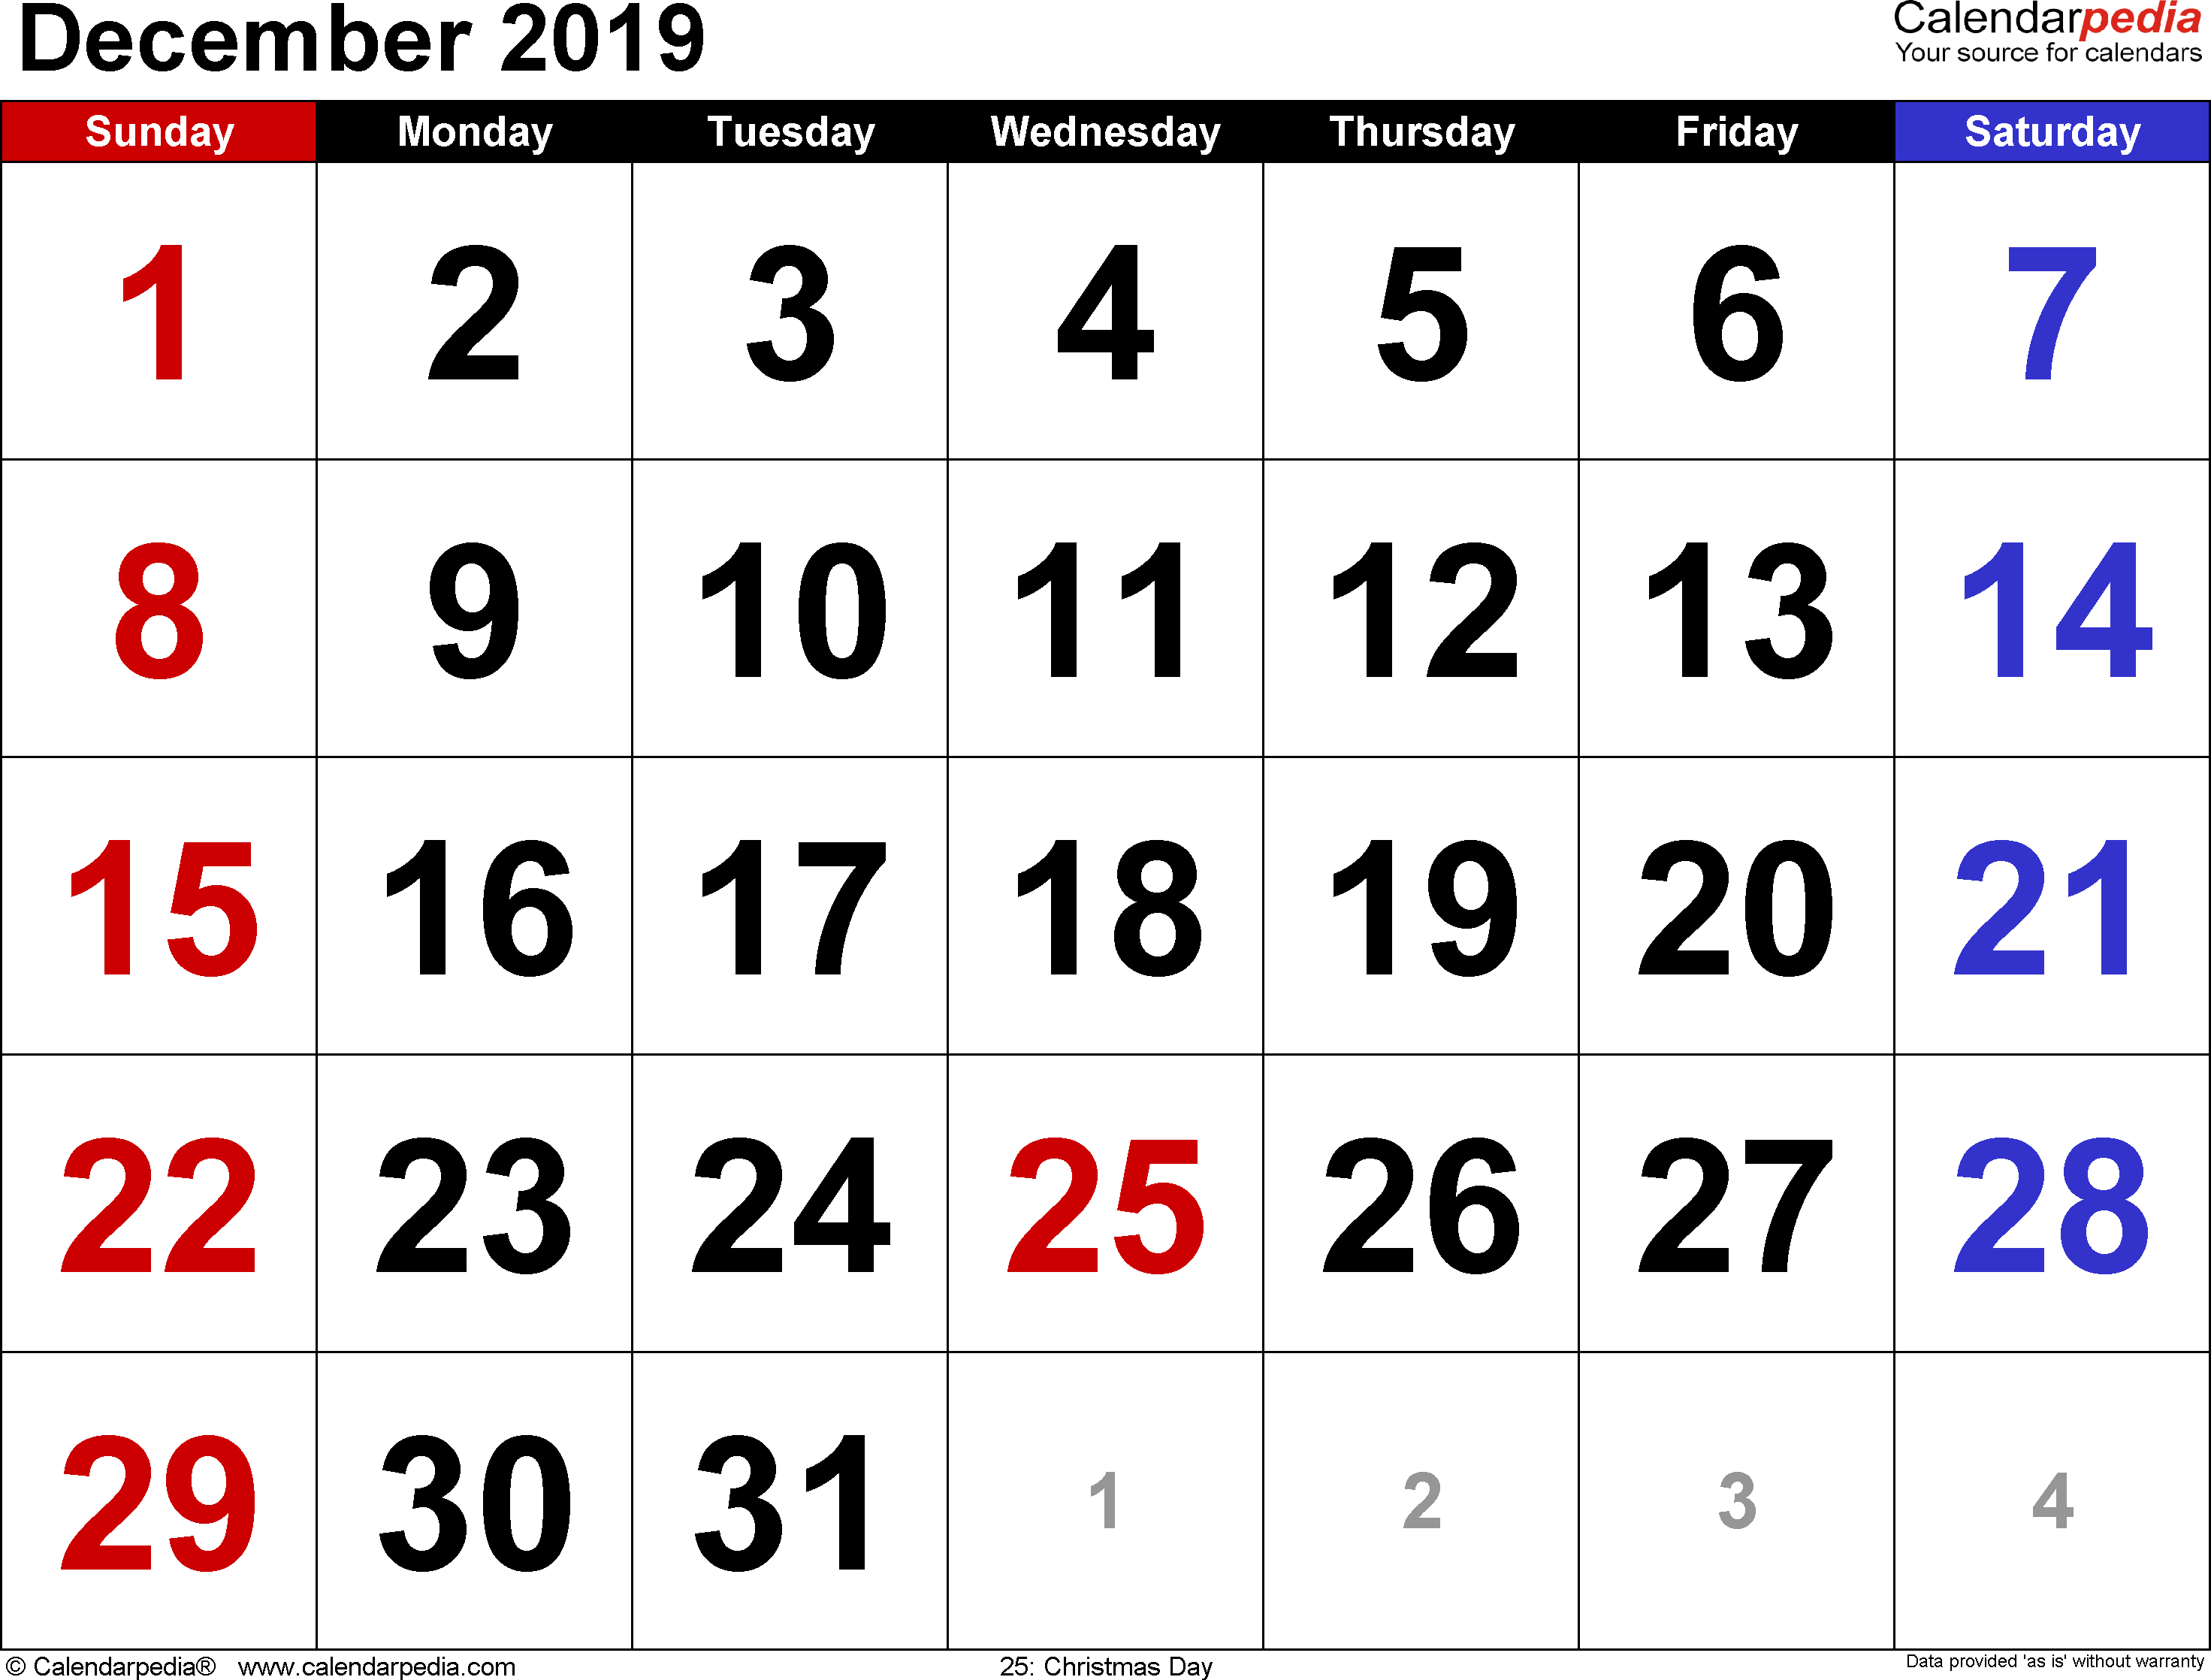 December 2019 Calendar Templates